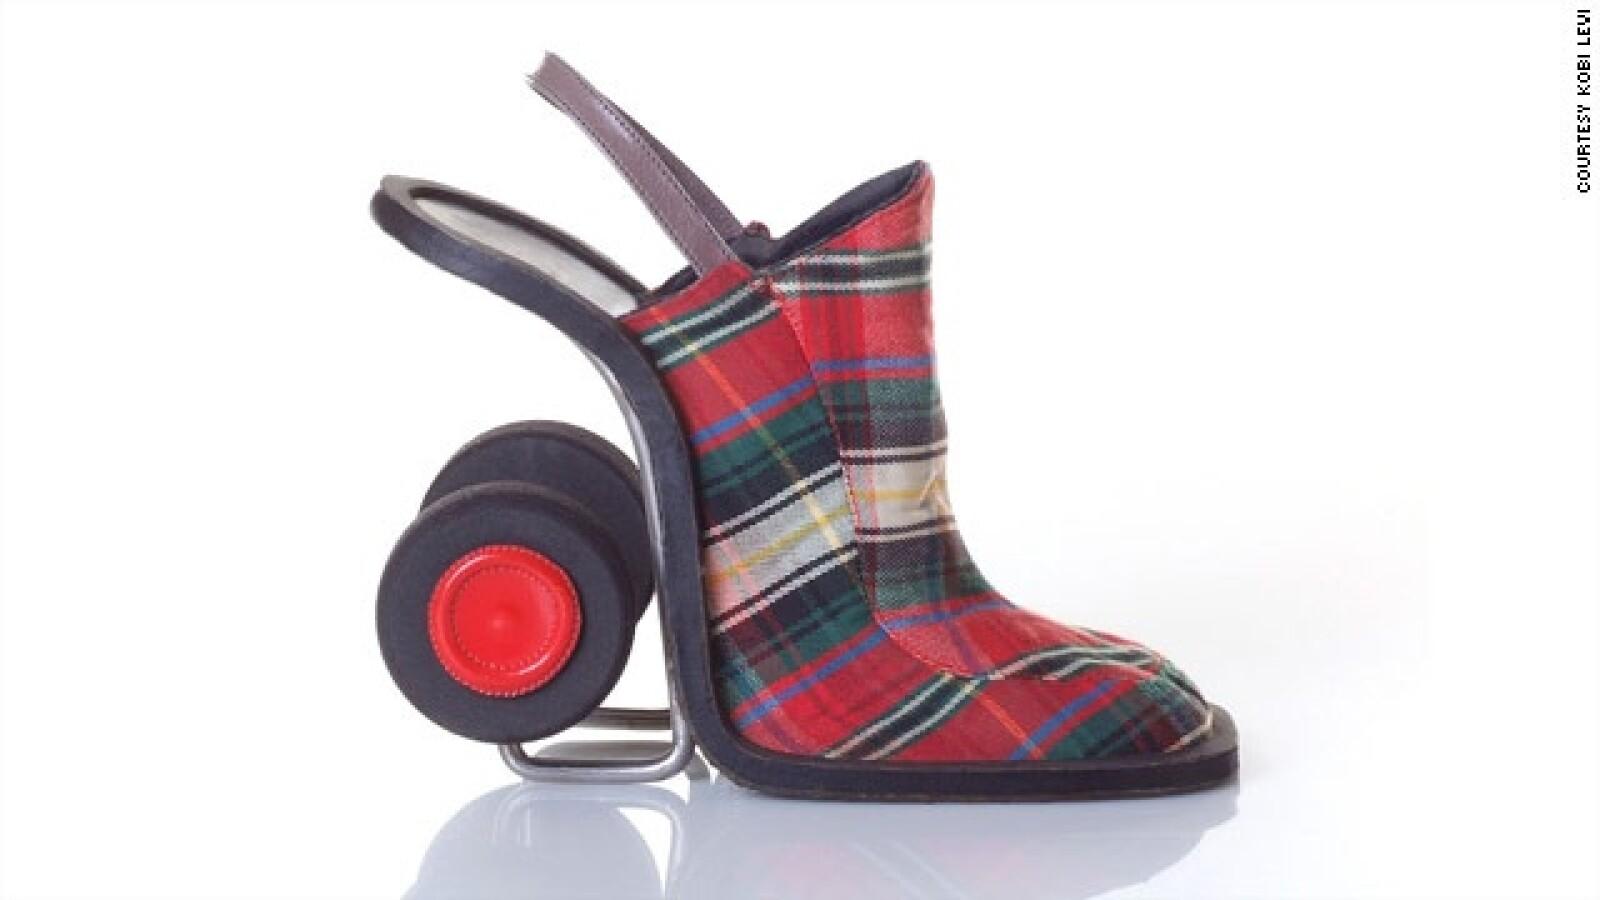 ZapatosArteSiete